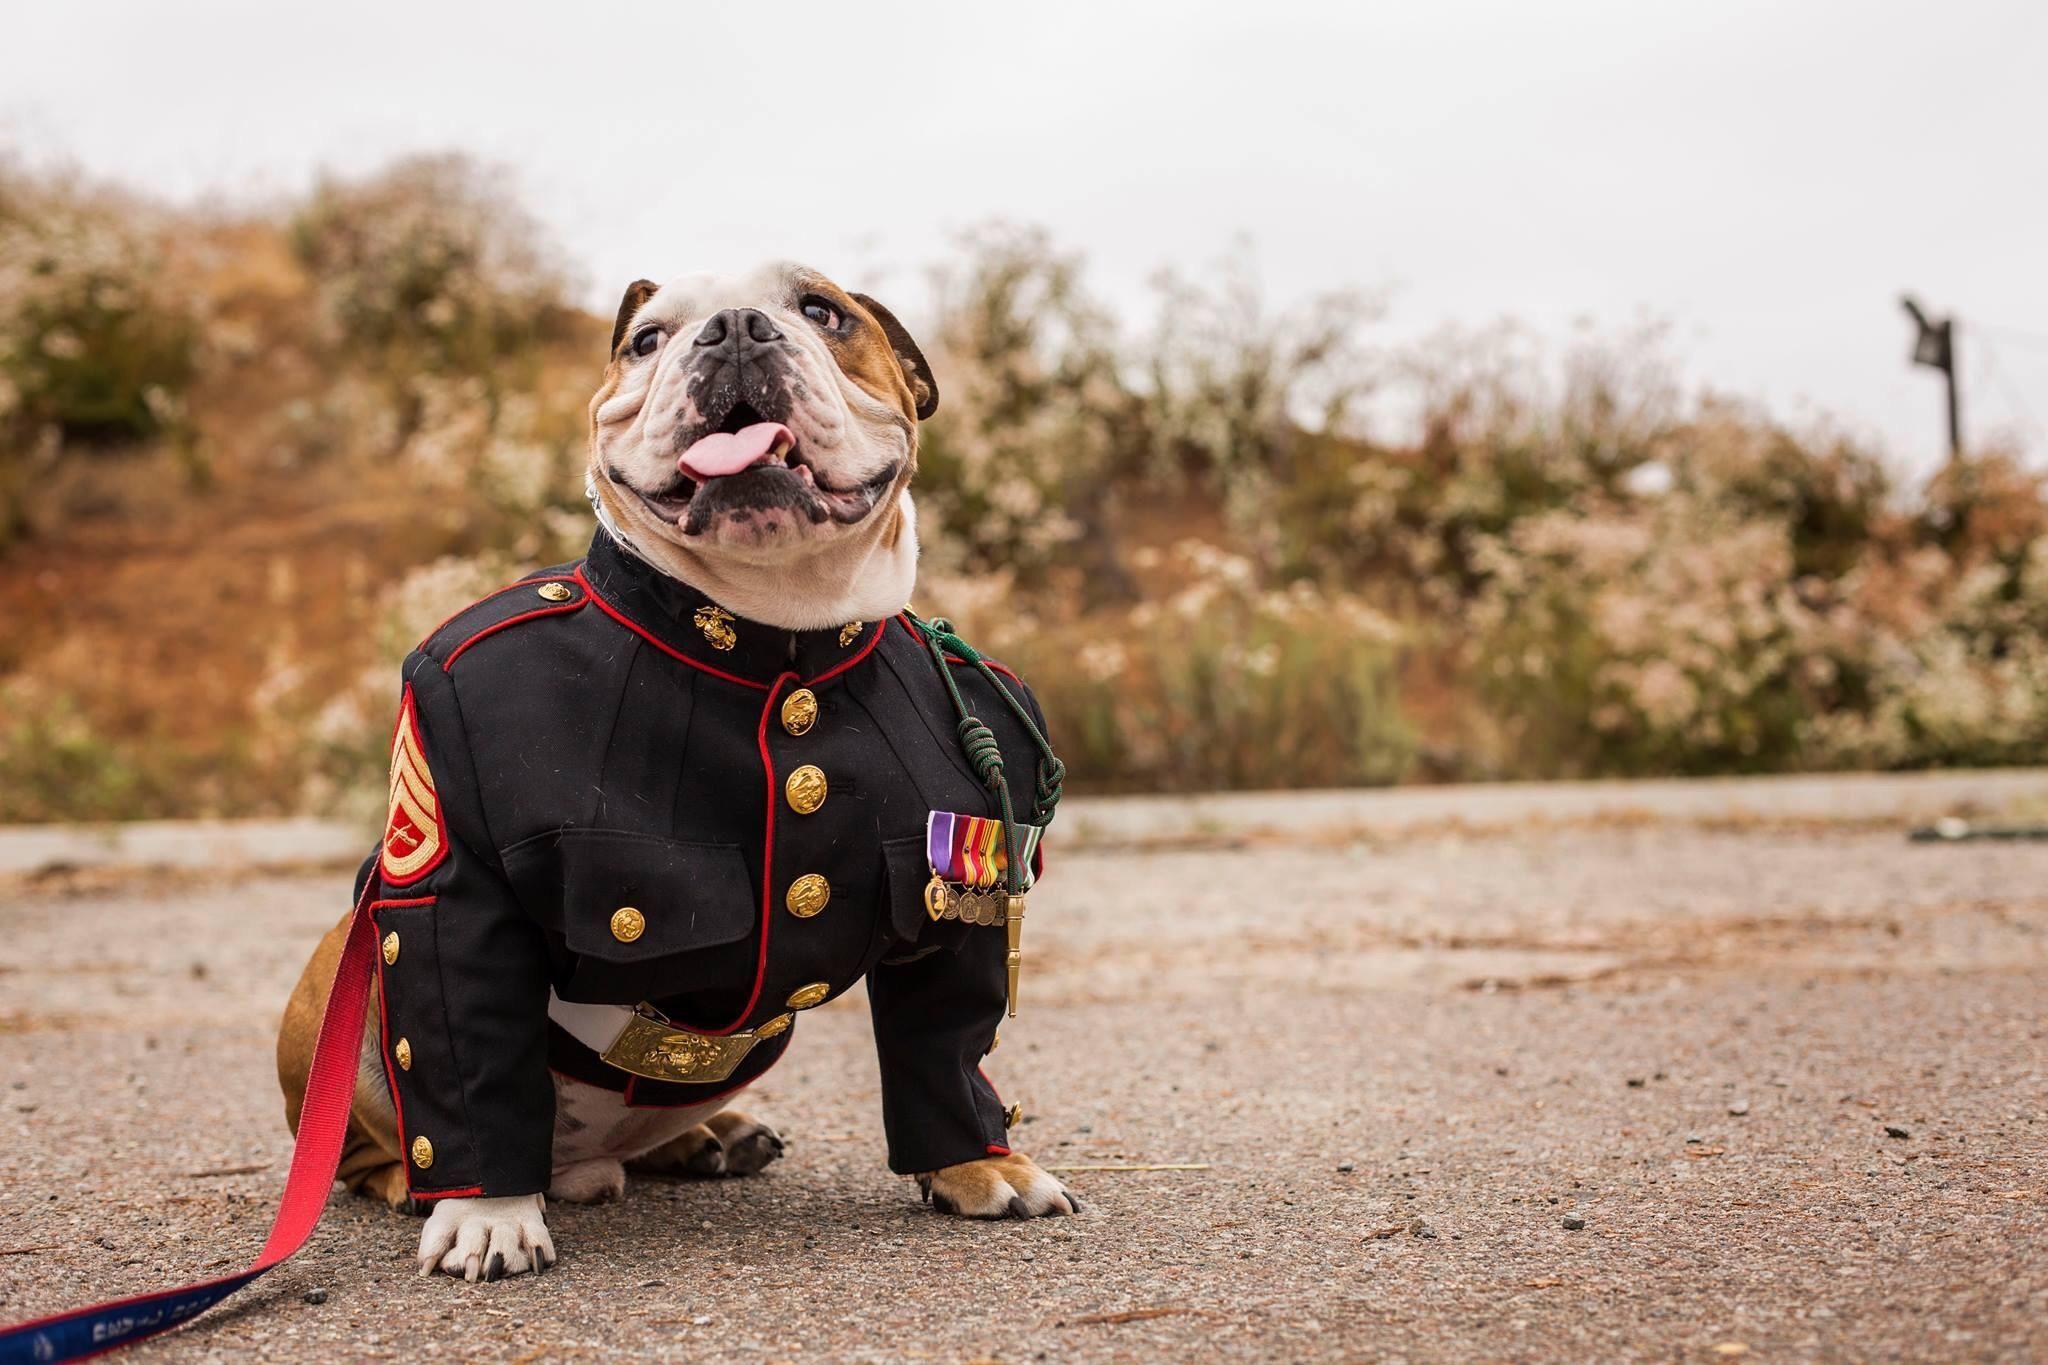 Cute Marine dog http//ift.tt/2sakjkT Marine dog, Marine